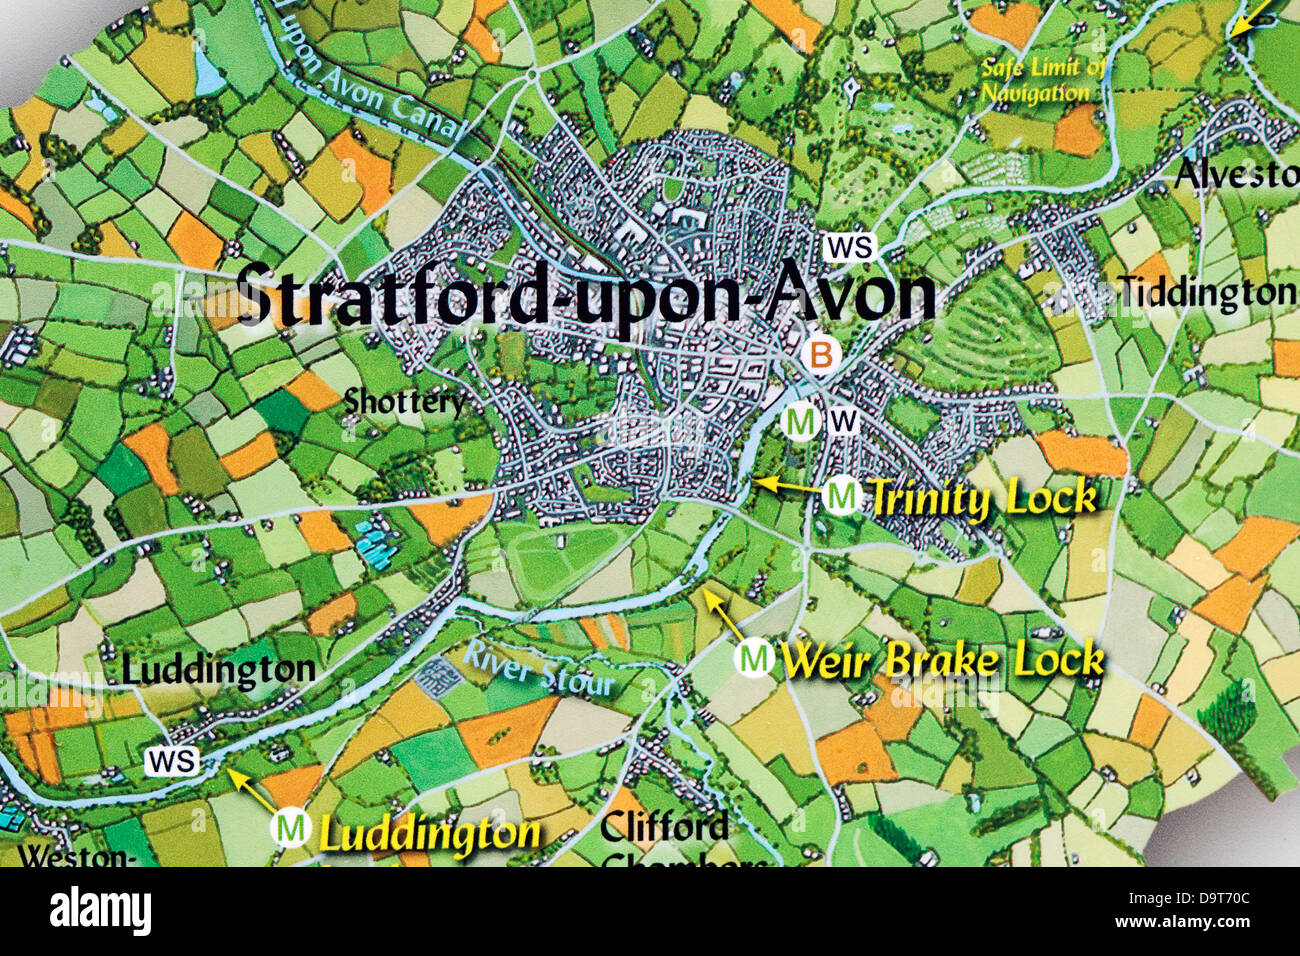 A Navigation Map Of Stratford Upon Avon